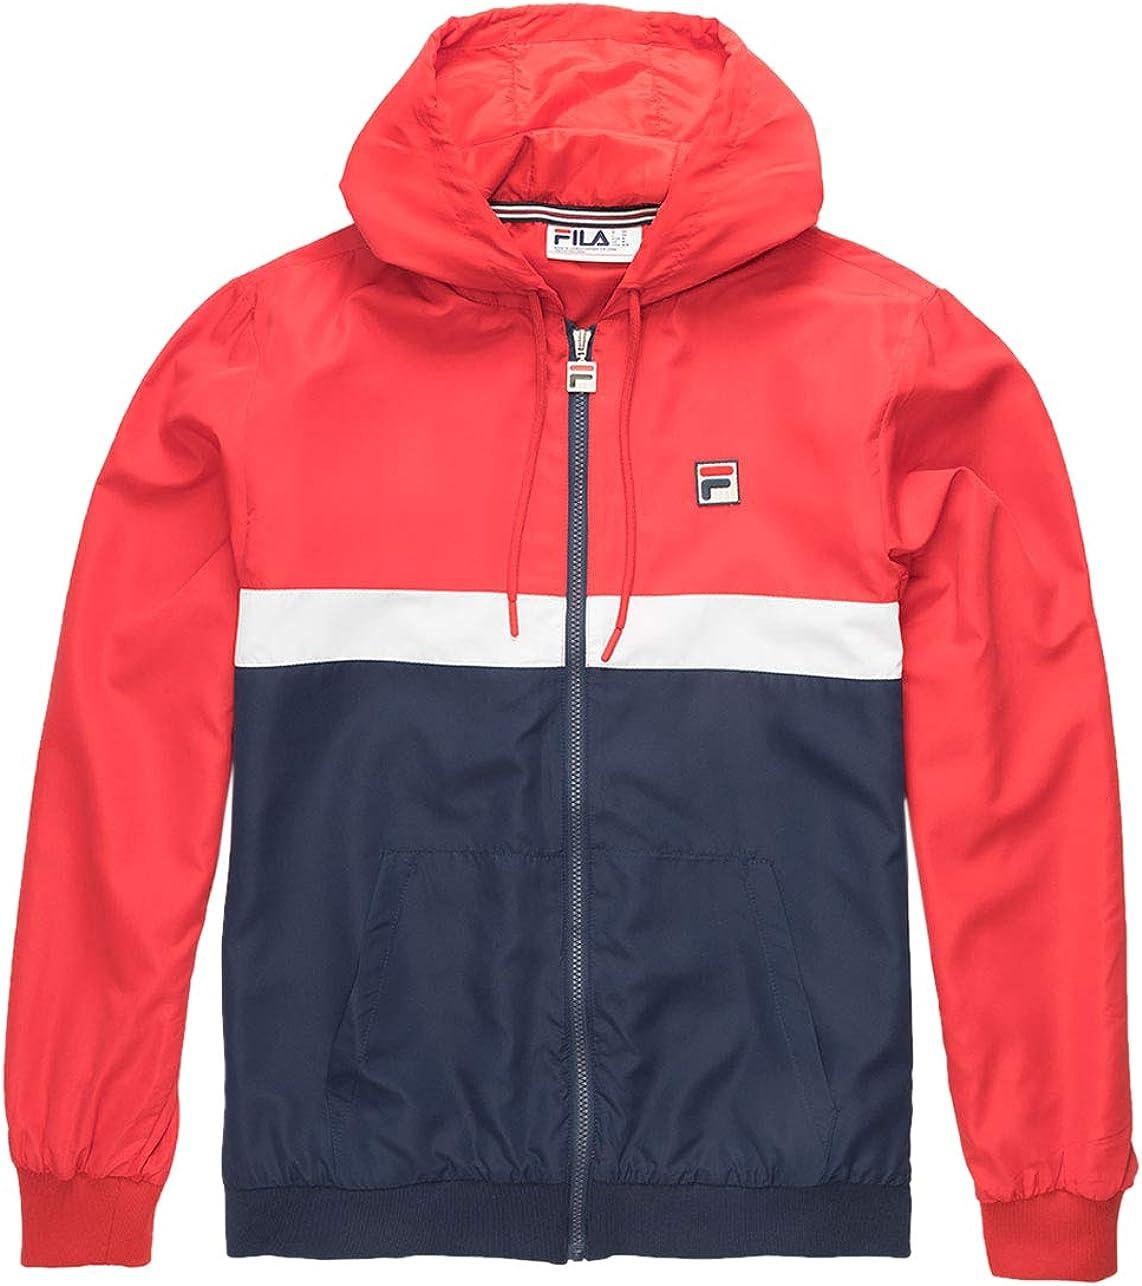 Fila 特価キャンペーン Men's Ambrose Hooded Jacket 期間限定の激安セール Wind